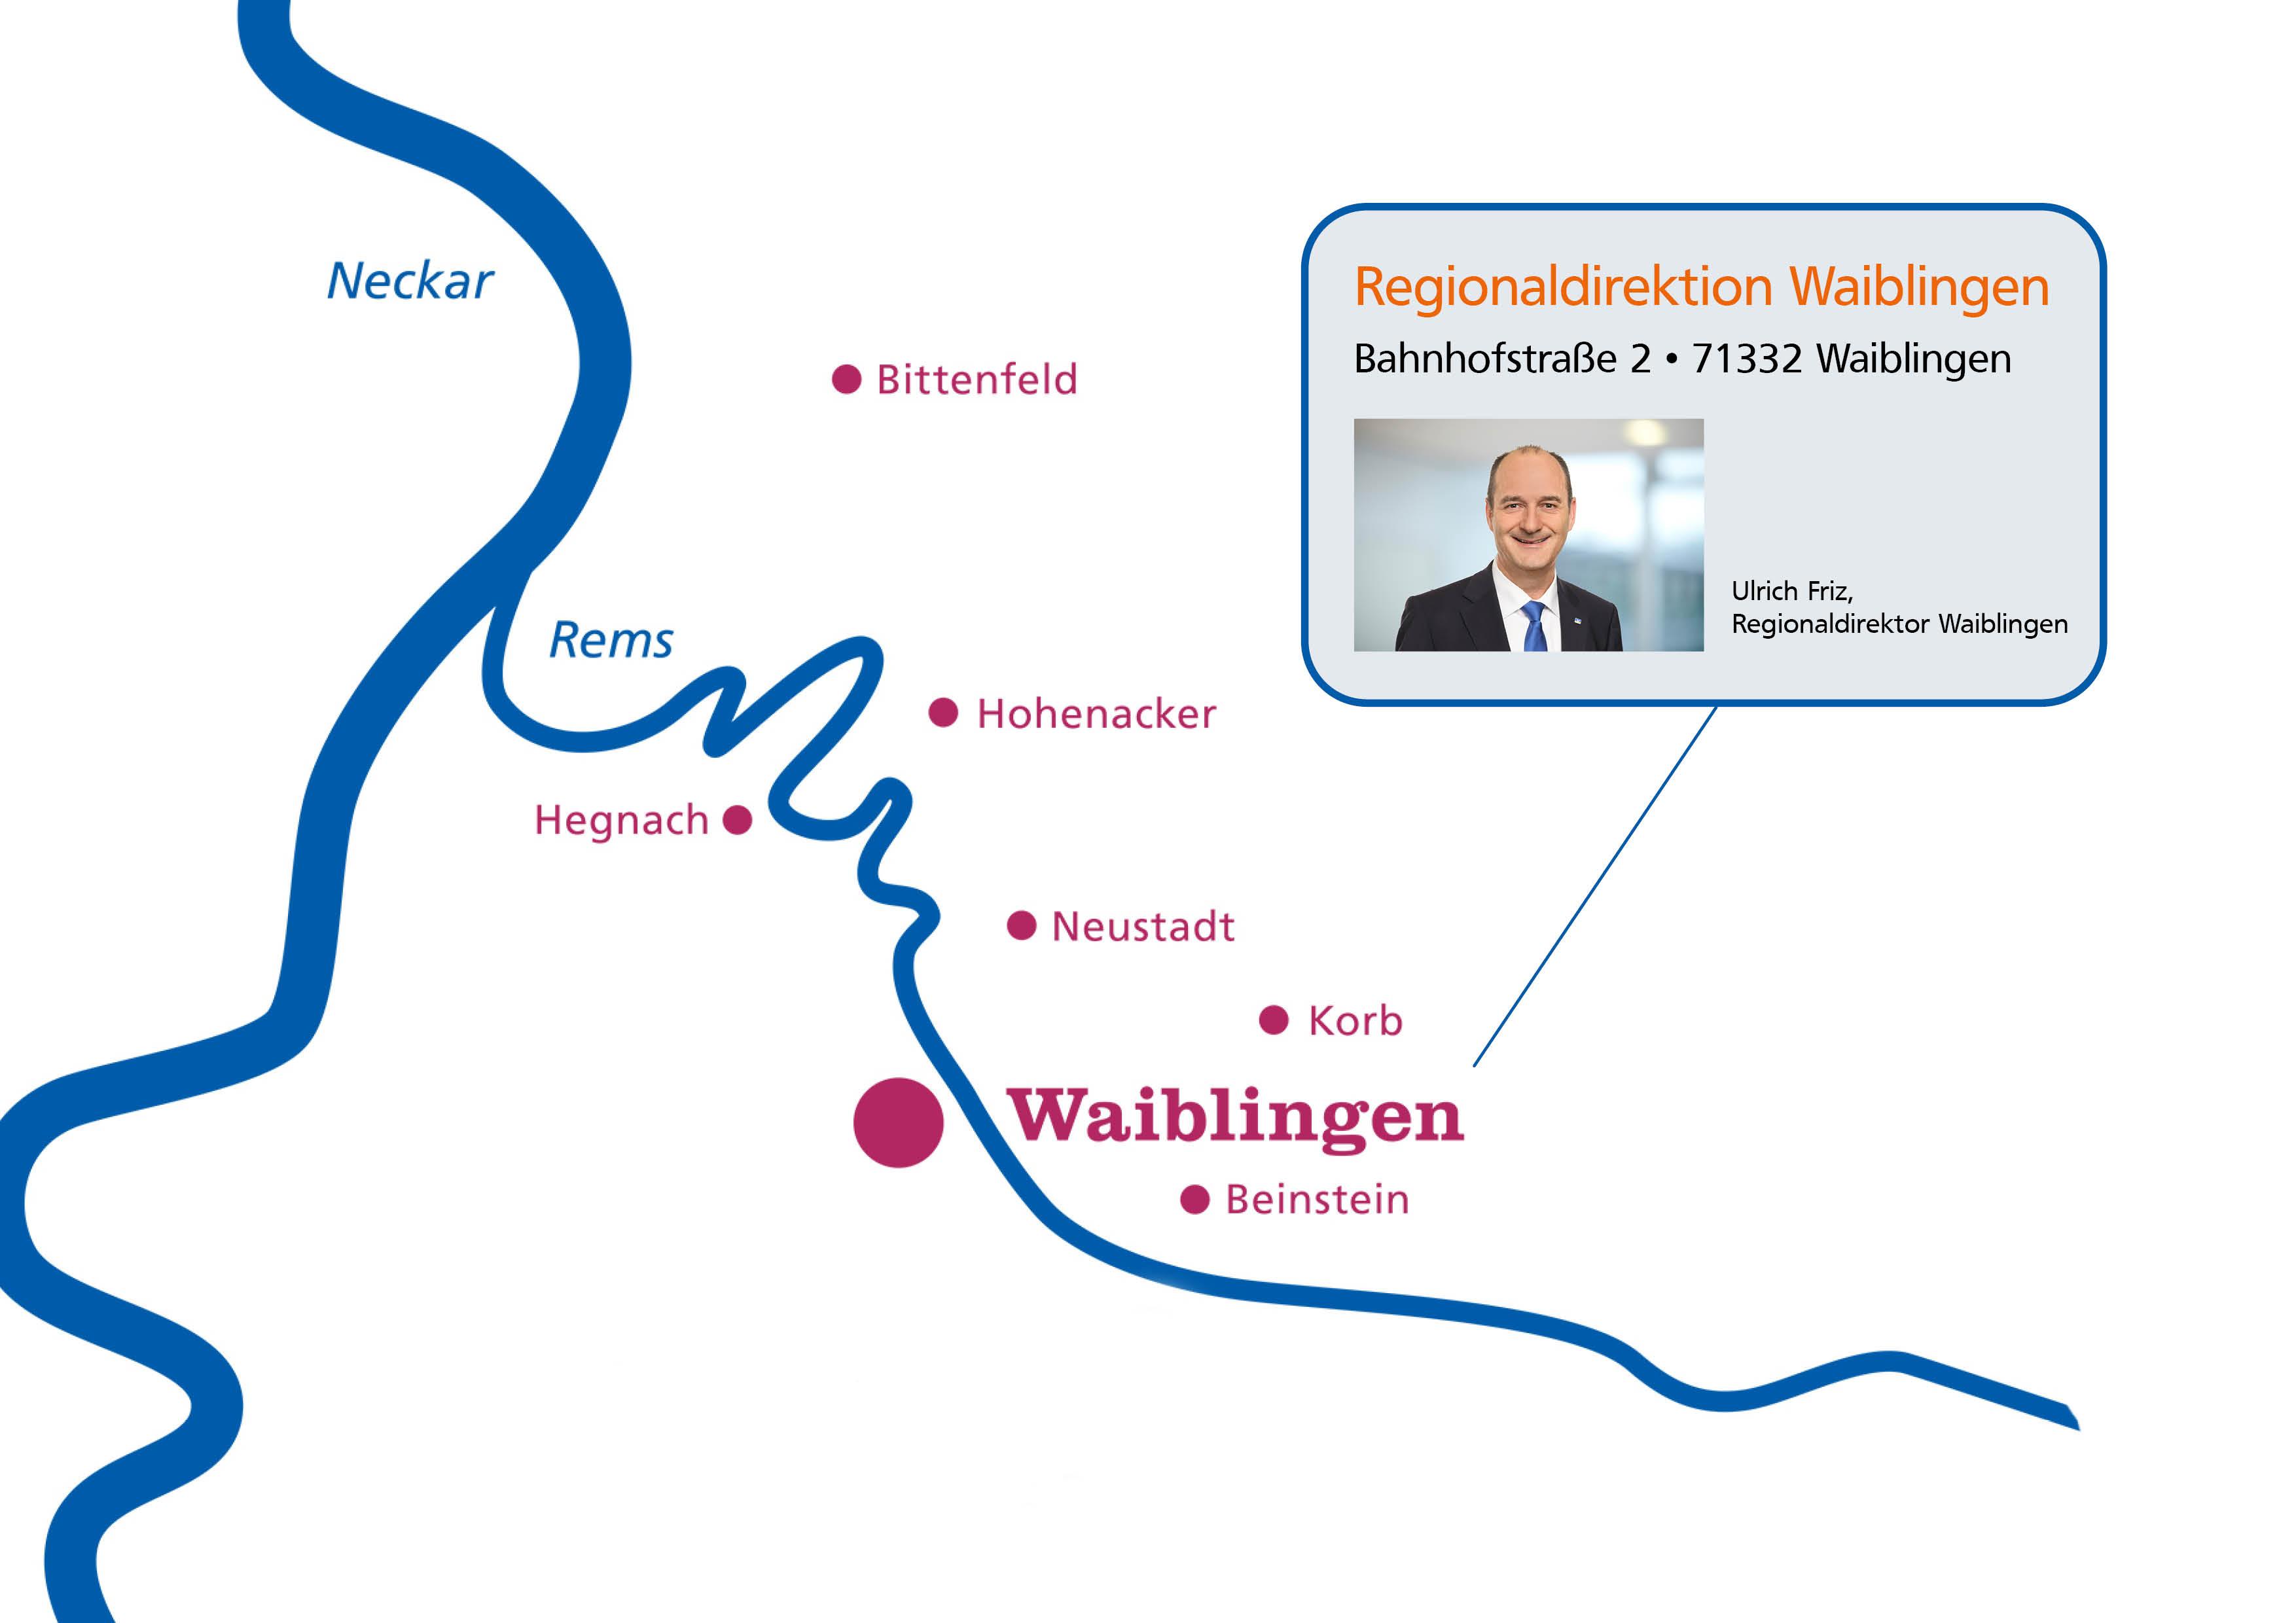 Regionaldirektion Waiblingen